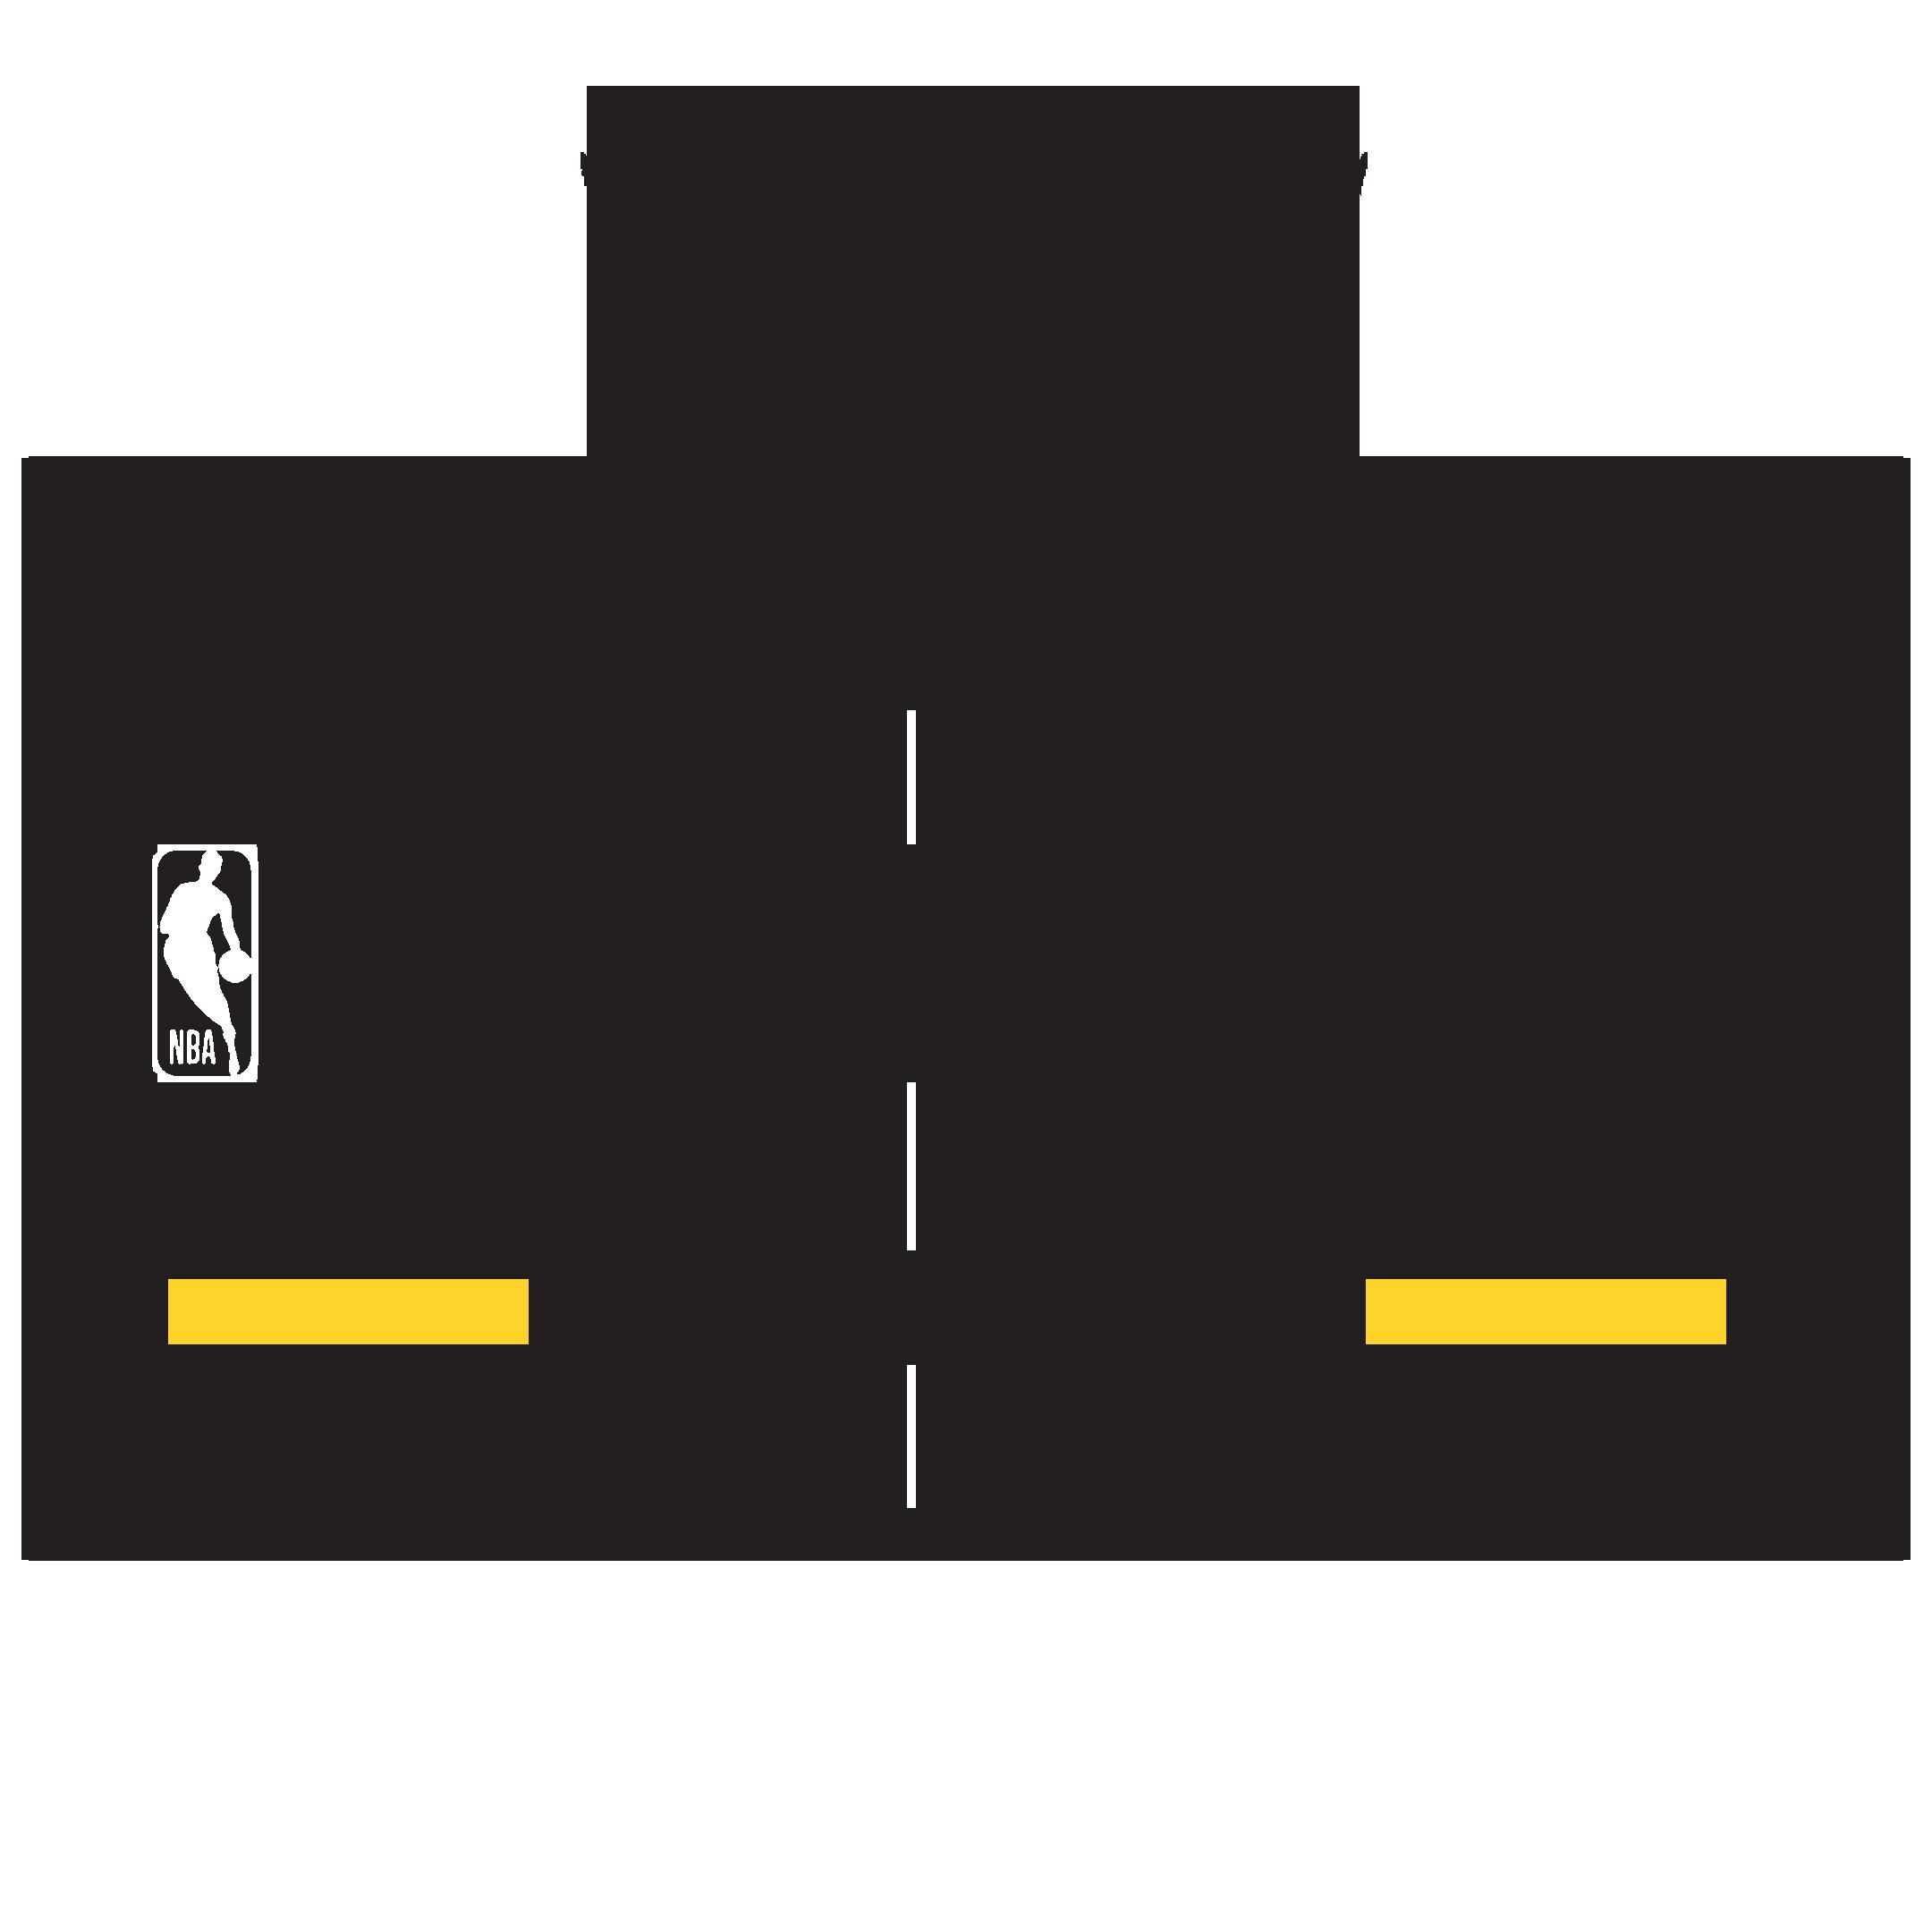 2018 NBA2k19 - Tournament Winner